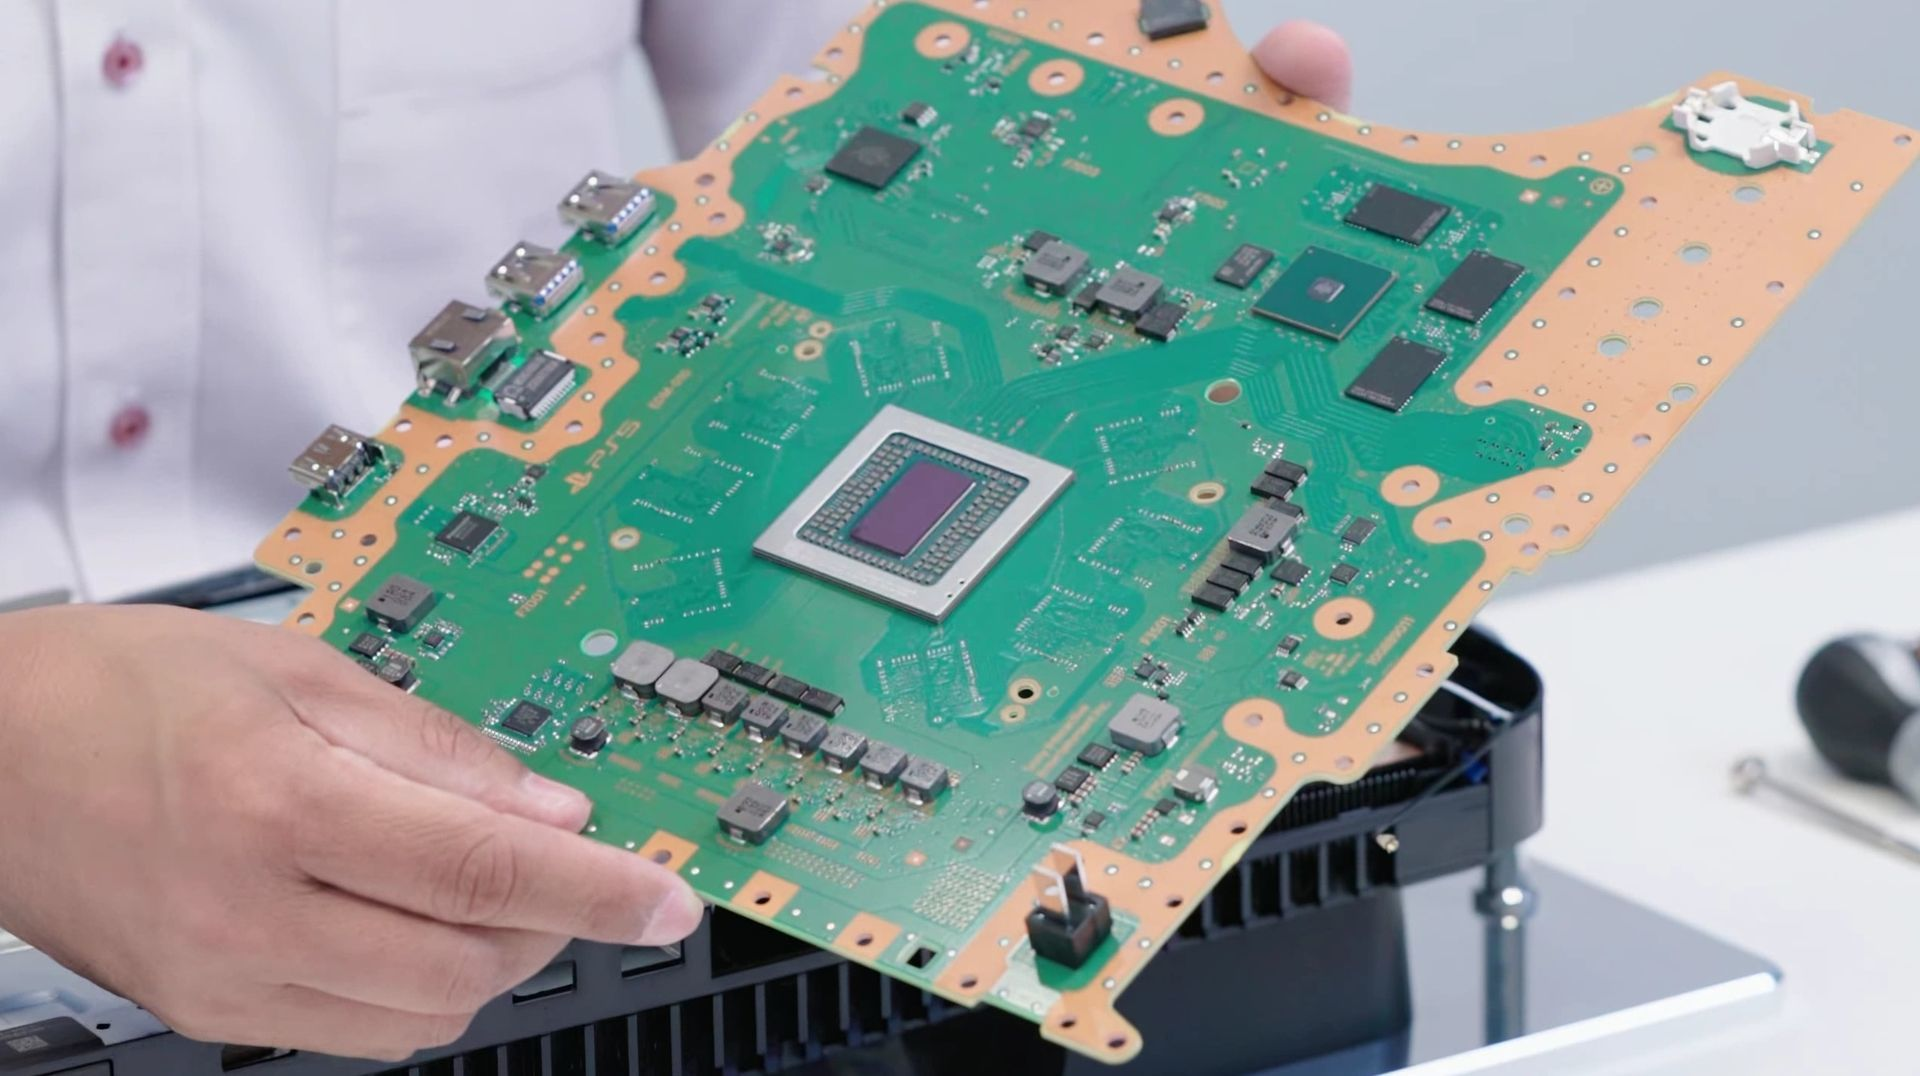 w4akd ww20w - DF「PS5は内蔵SSD逝ったら交換修理だし拡張SSDも冷えねーだろコレ」